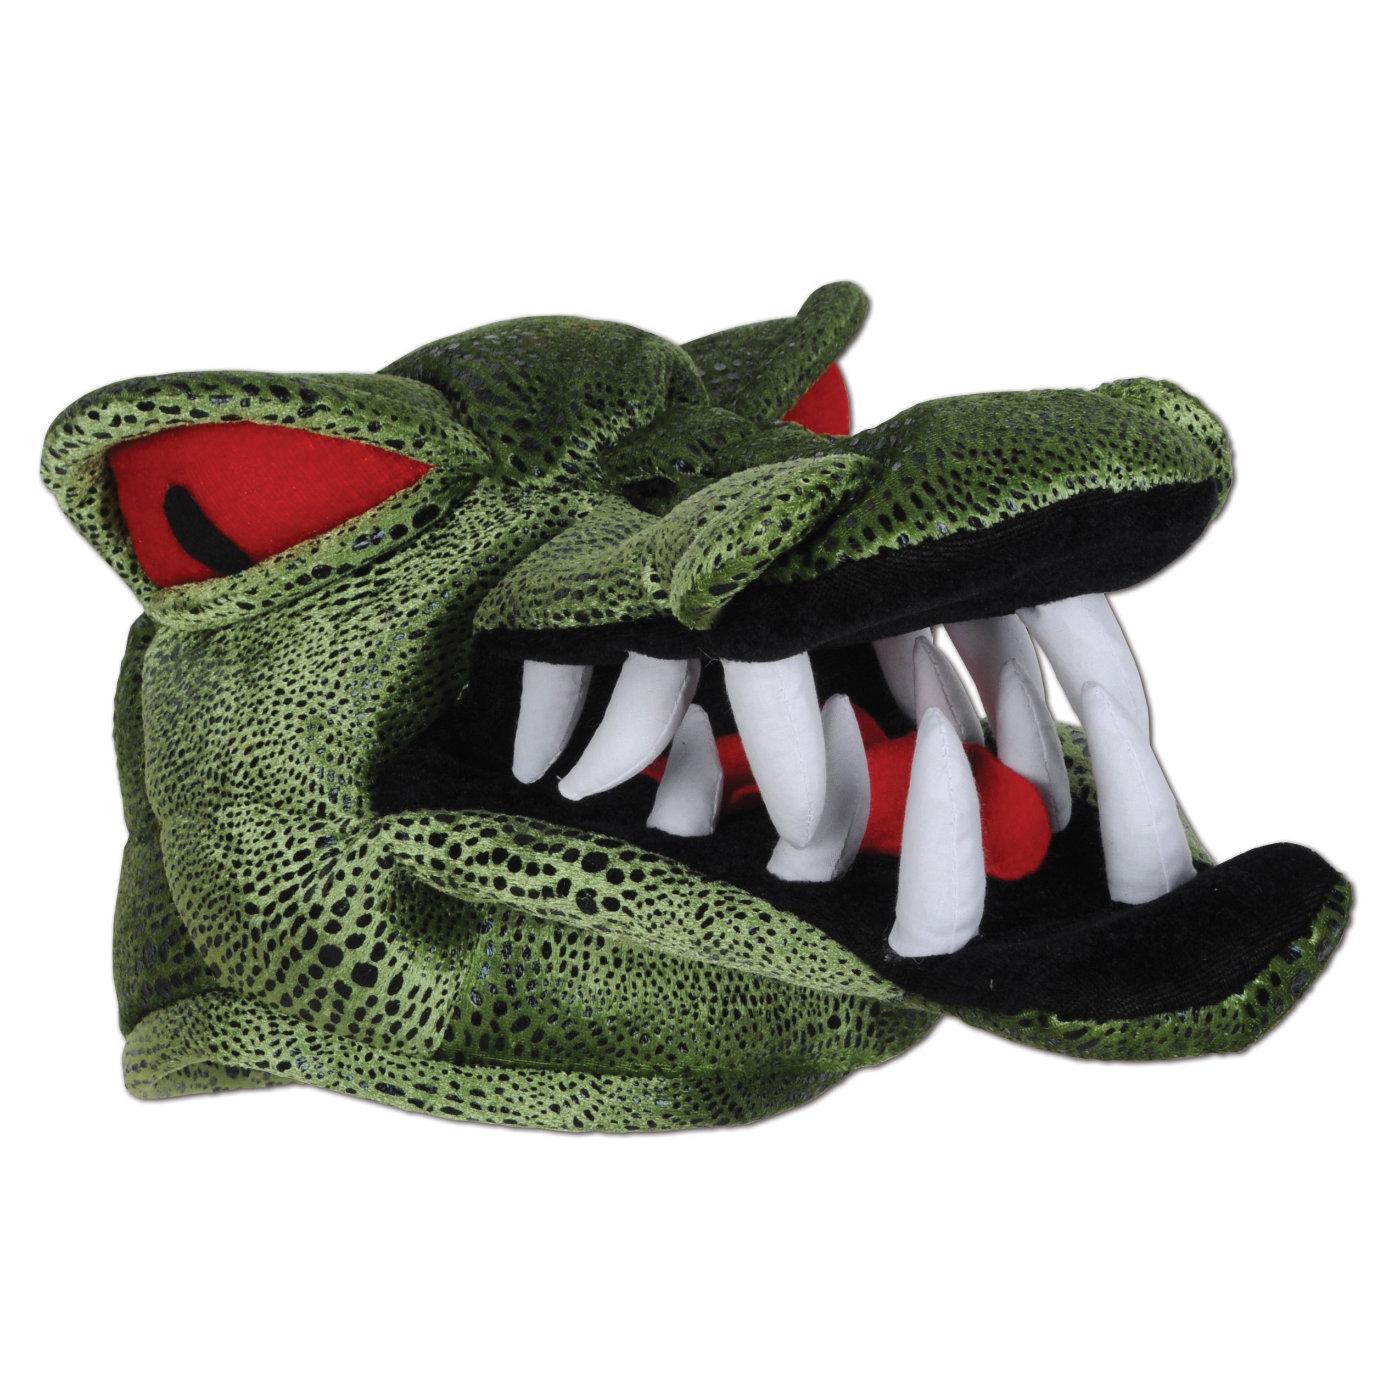 Plush Crocodile Hat (6) image